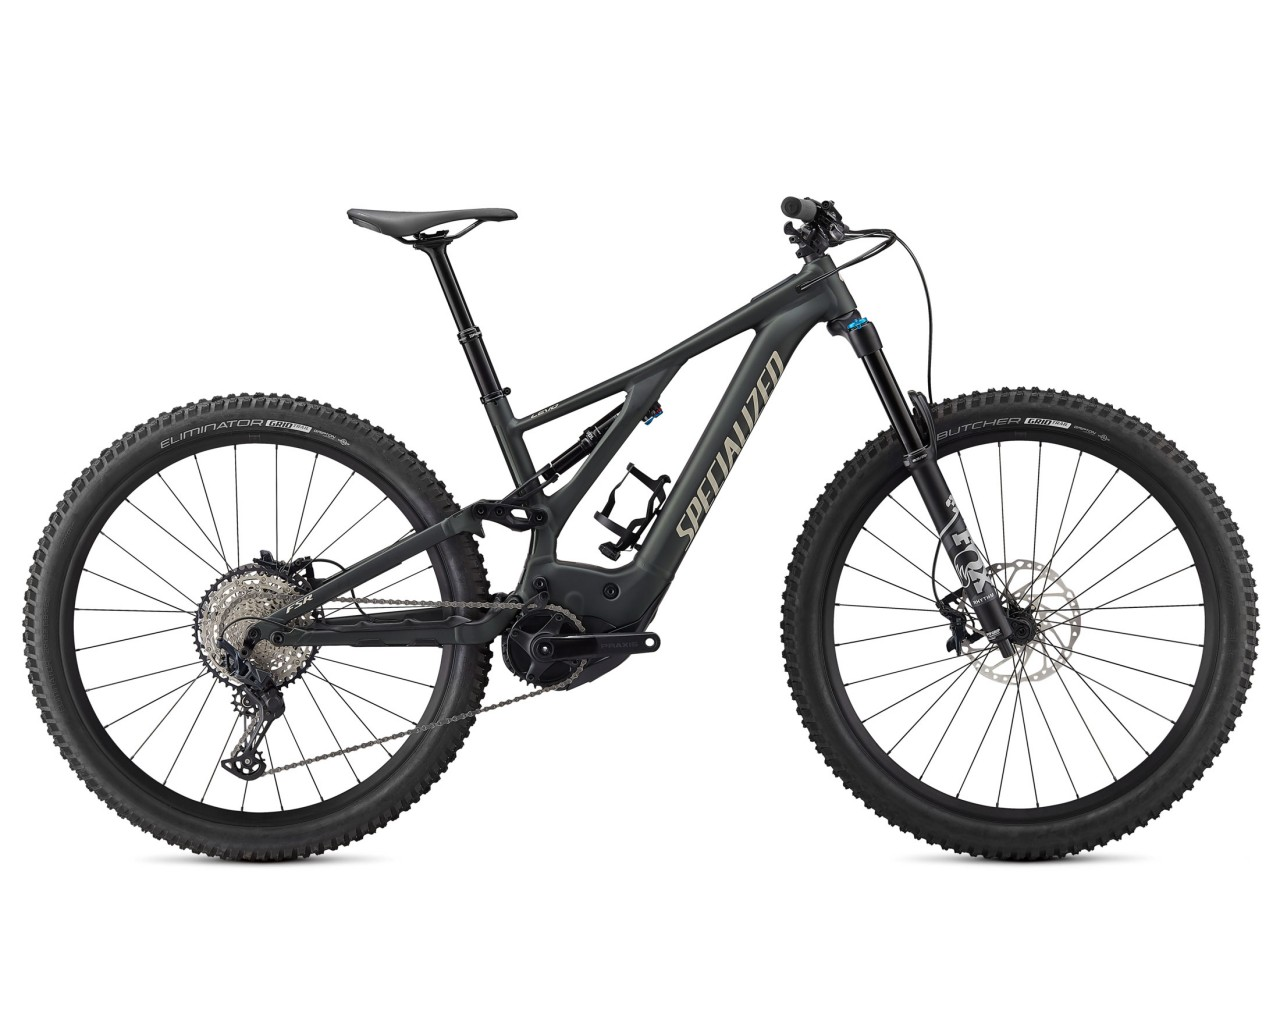 Specialized Levo Comp 29 - Pedelec Mountain Bike Fullsuspension 2021 | oak green metallic-black-gloss white mtns